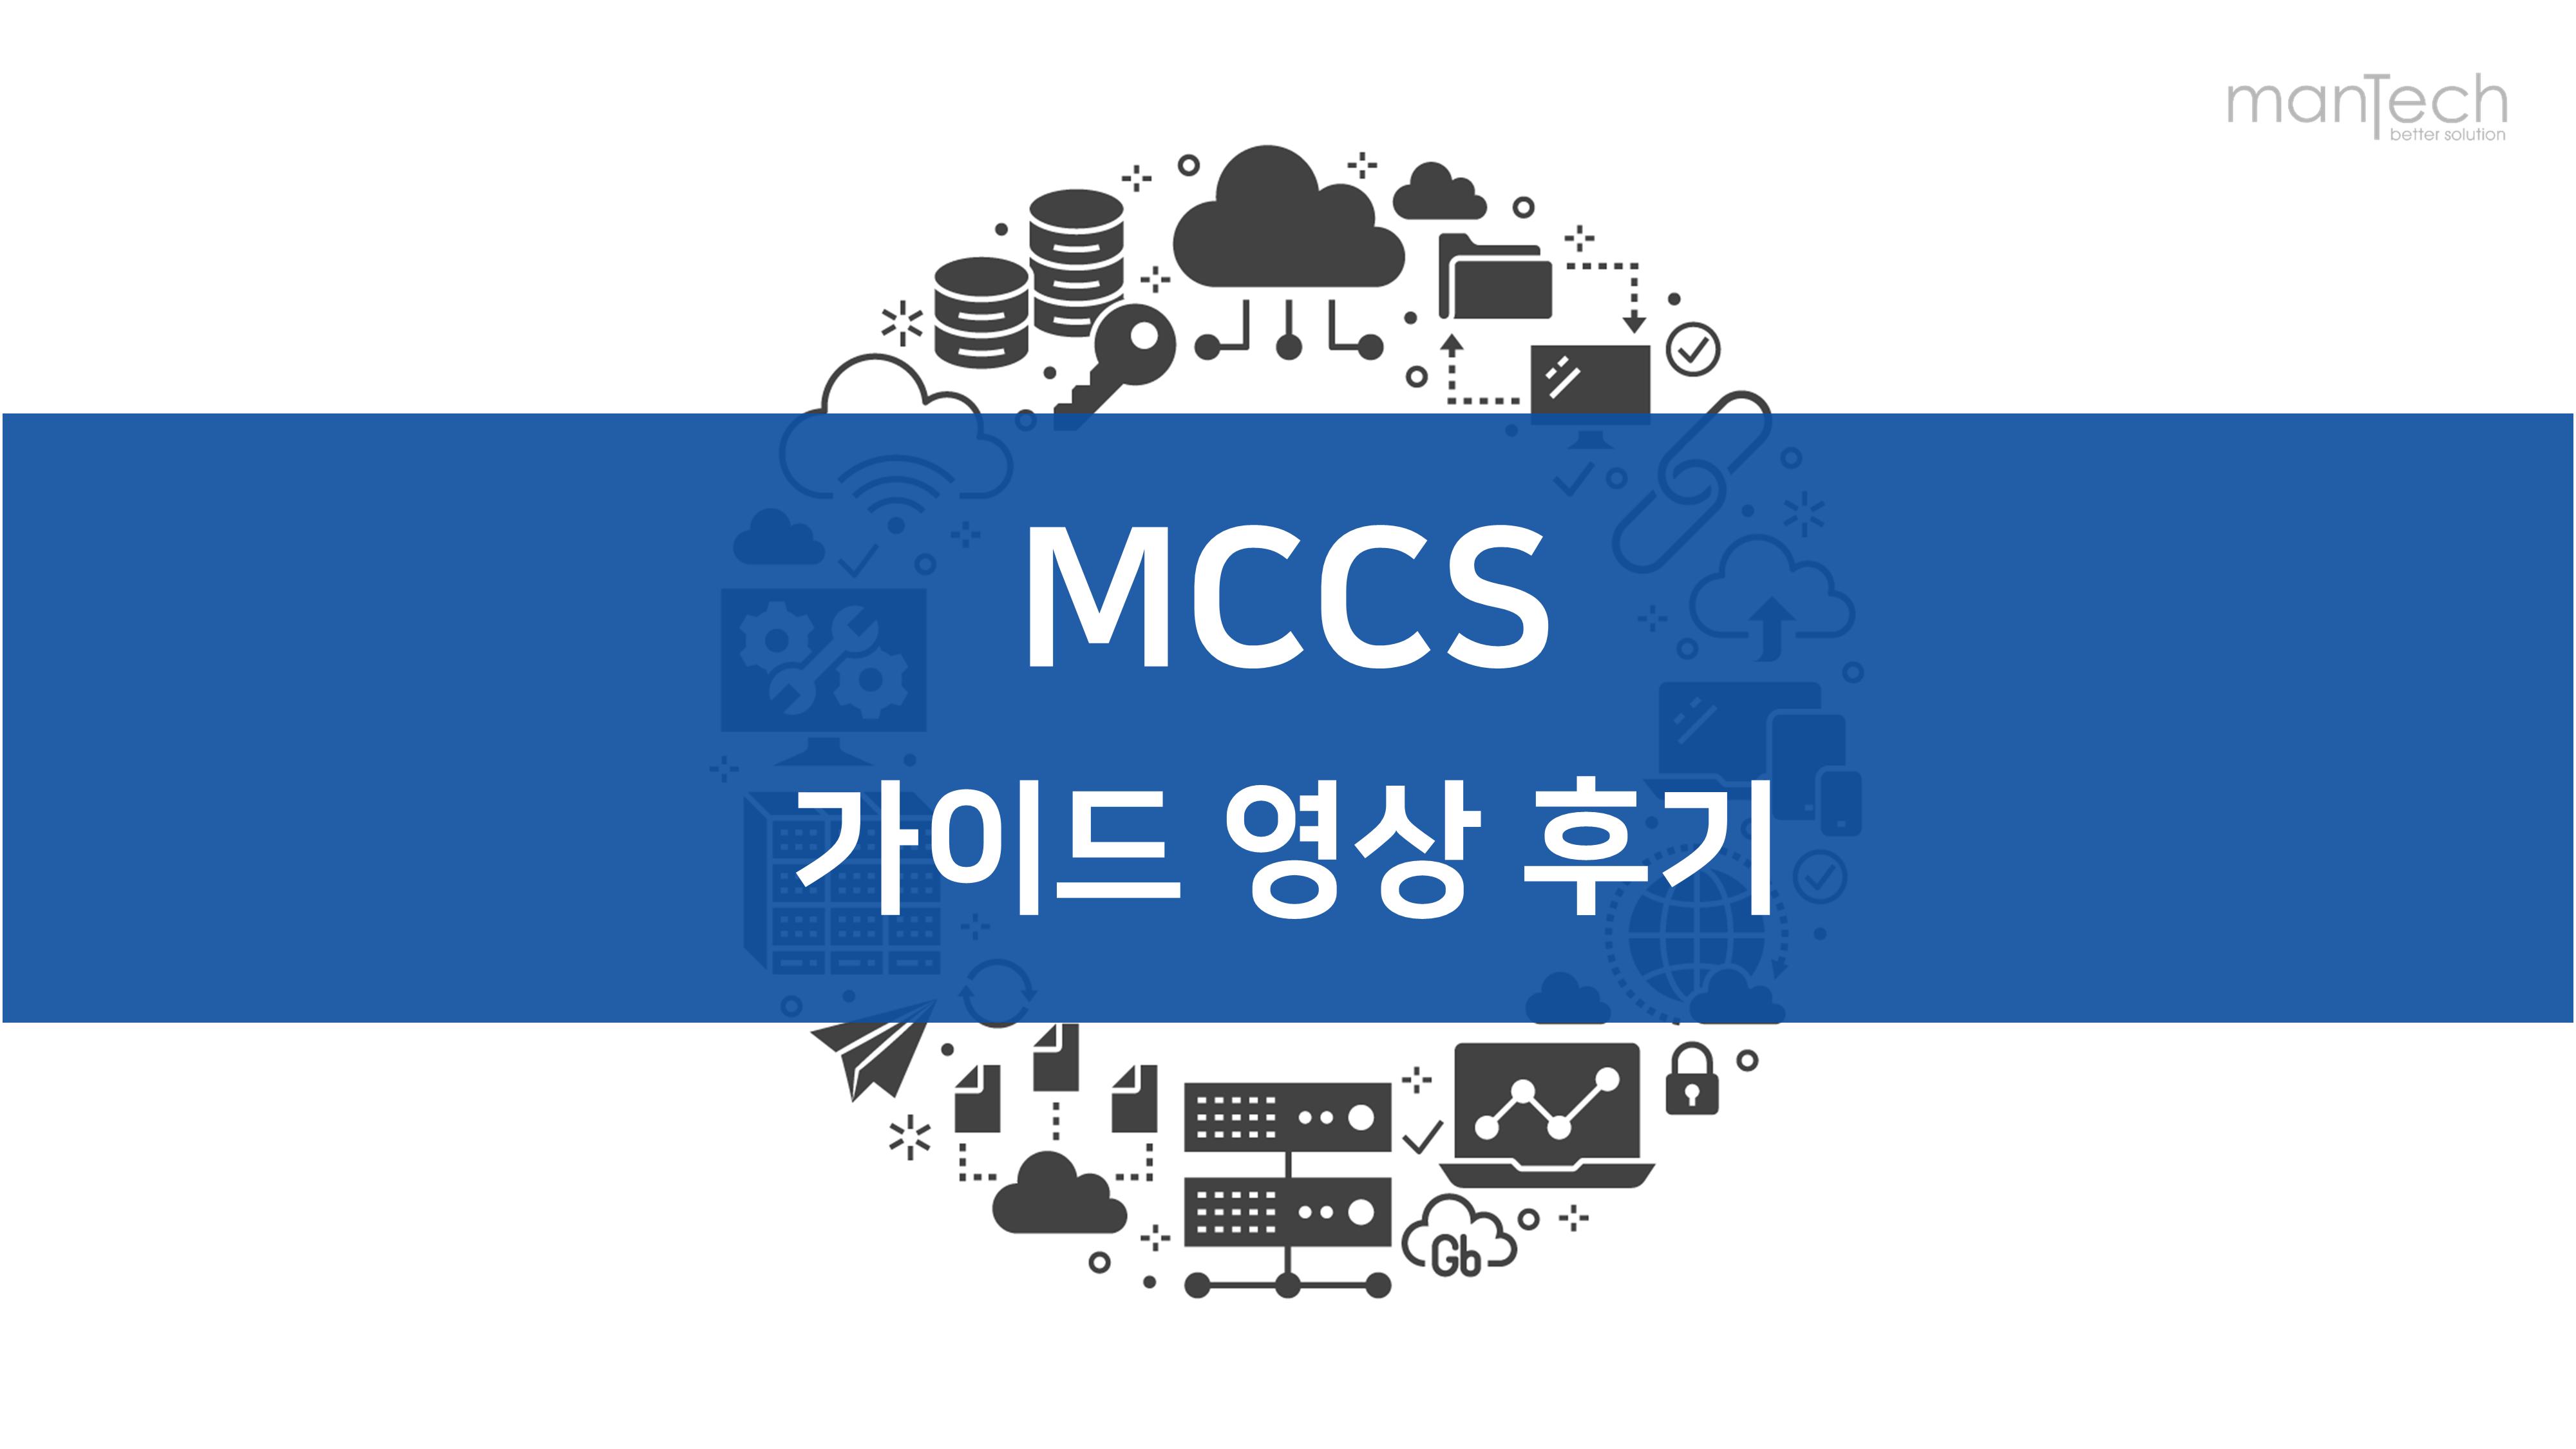 MCCS 가이드 동영상 실사용 후기